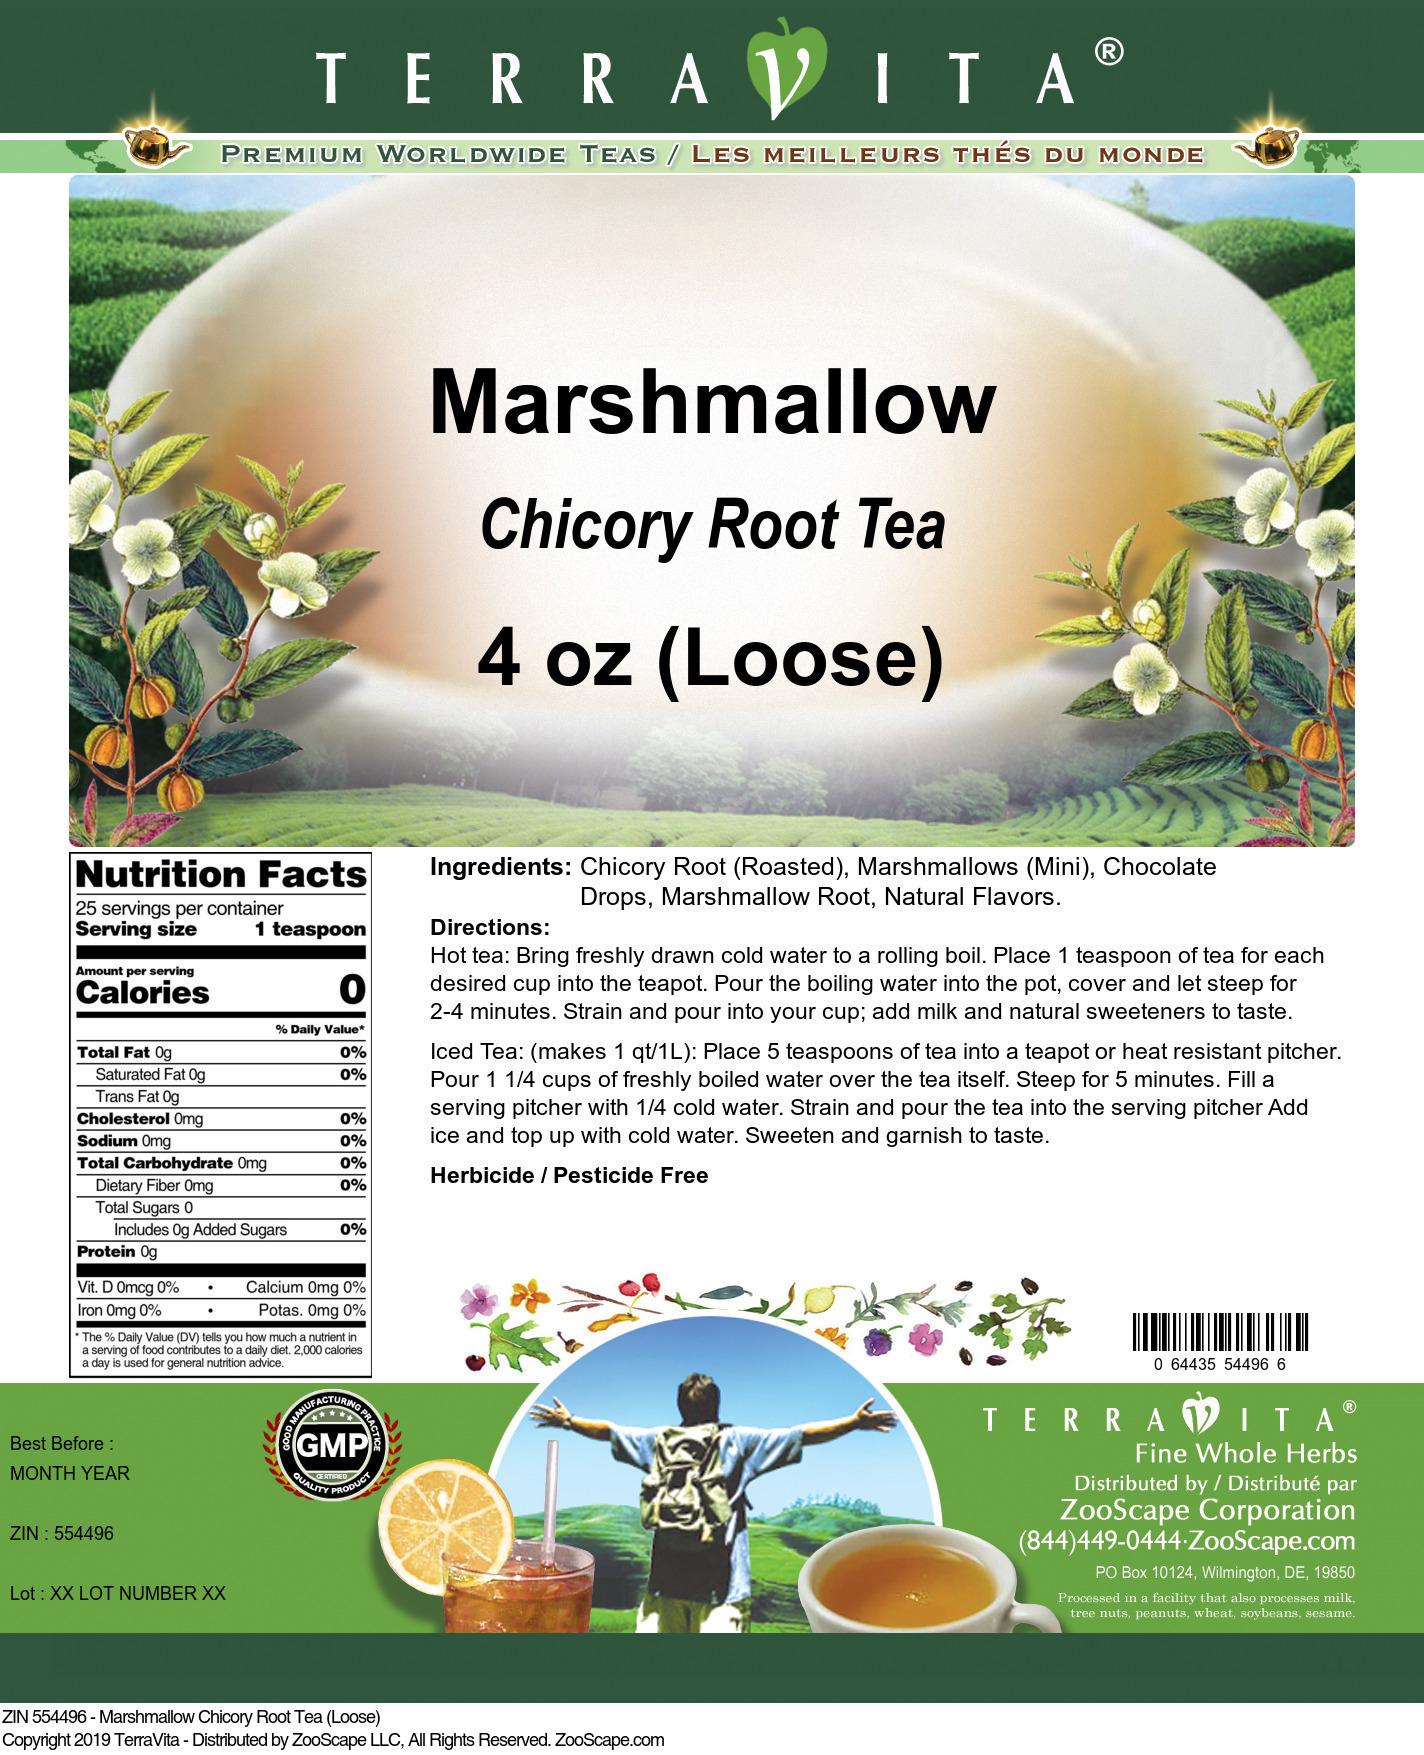 Marshmallow Chicory Root Tea (Loose)